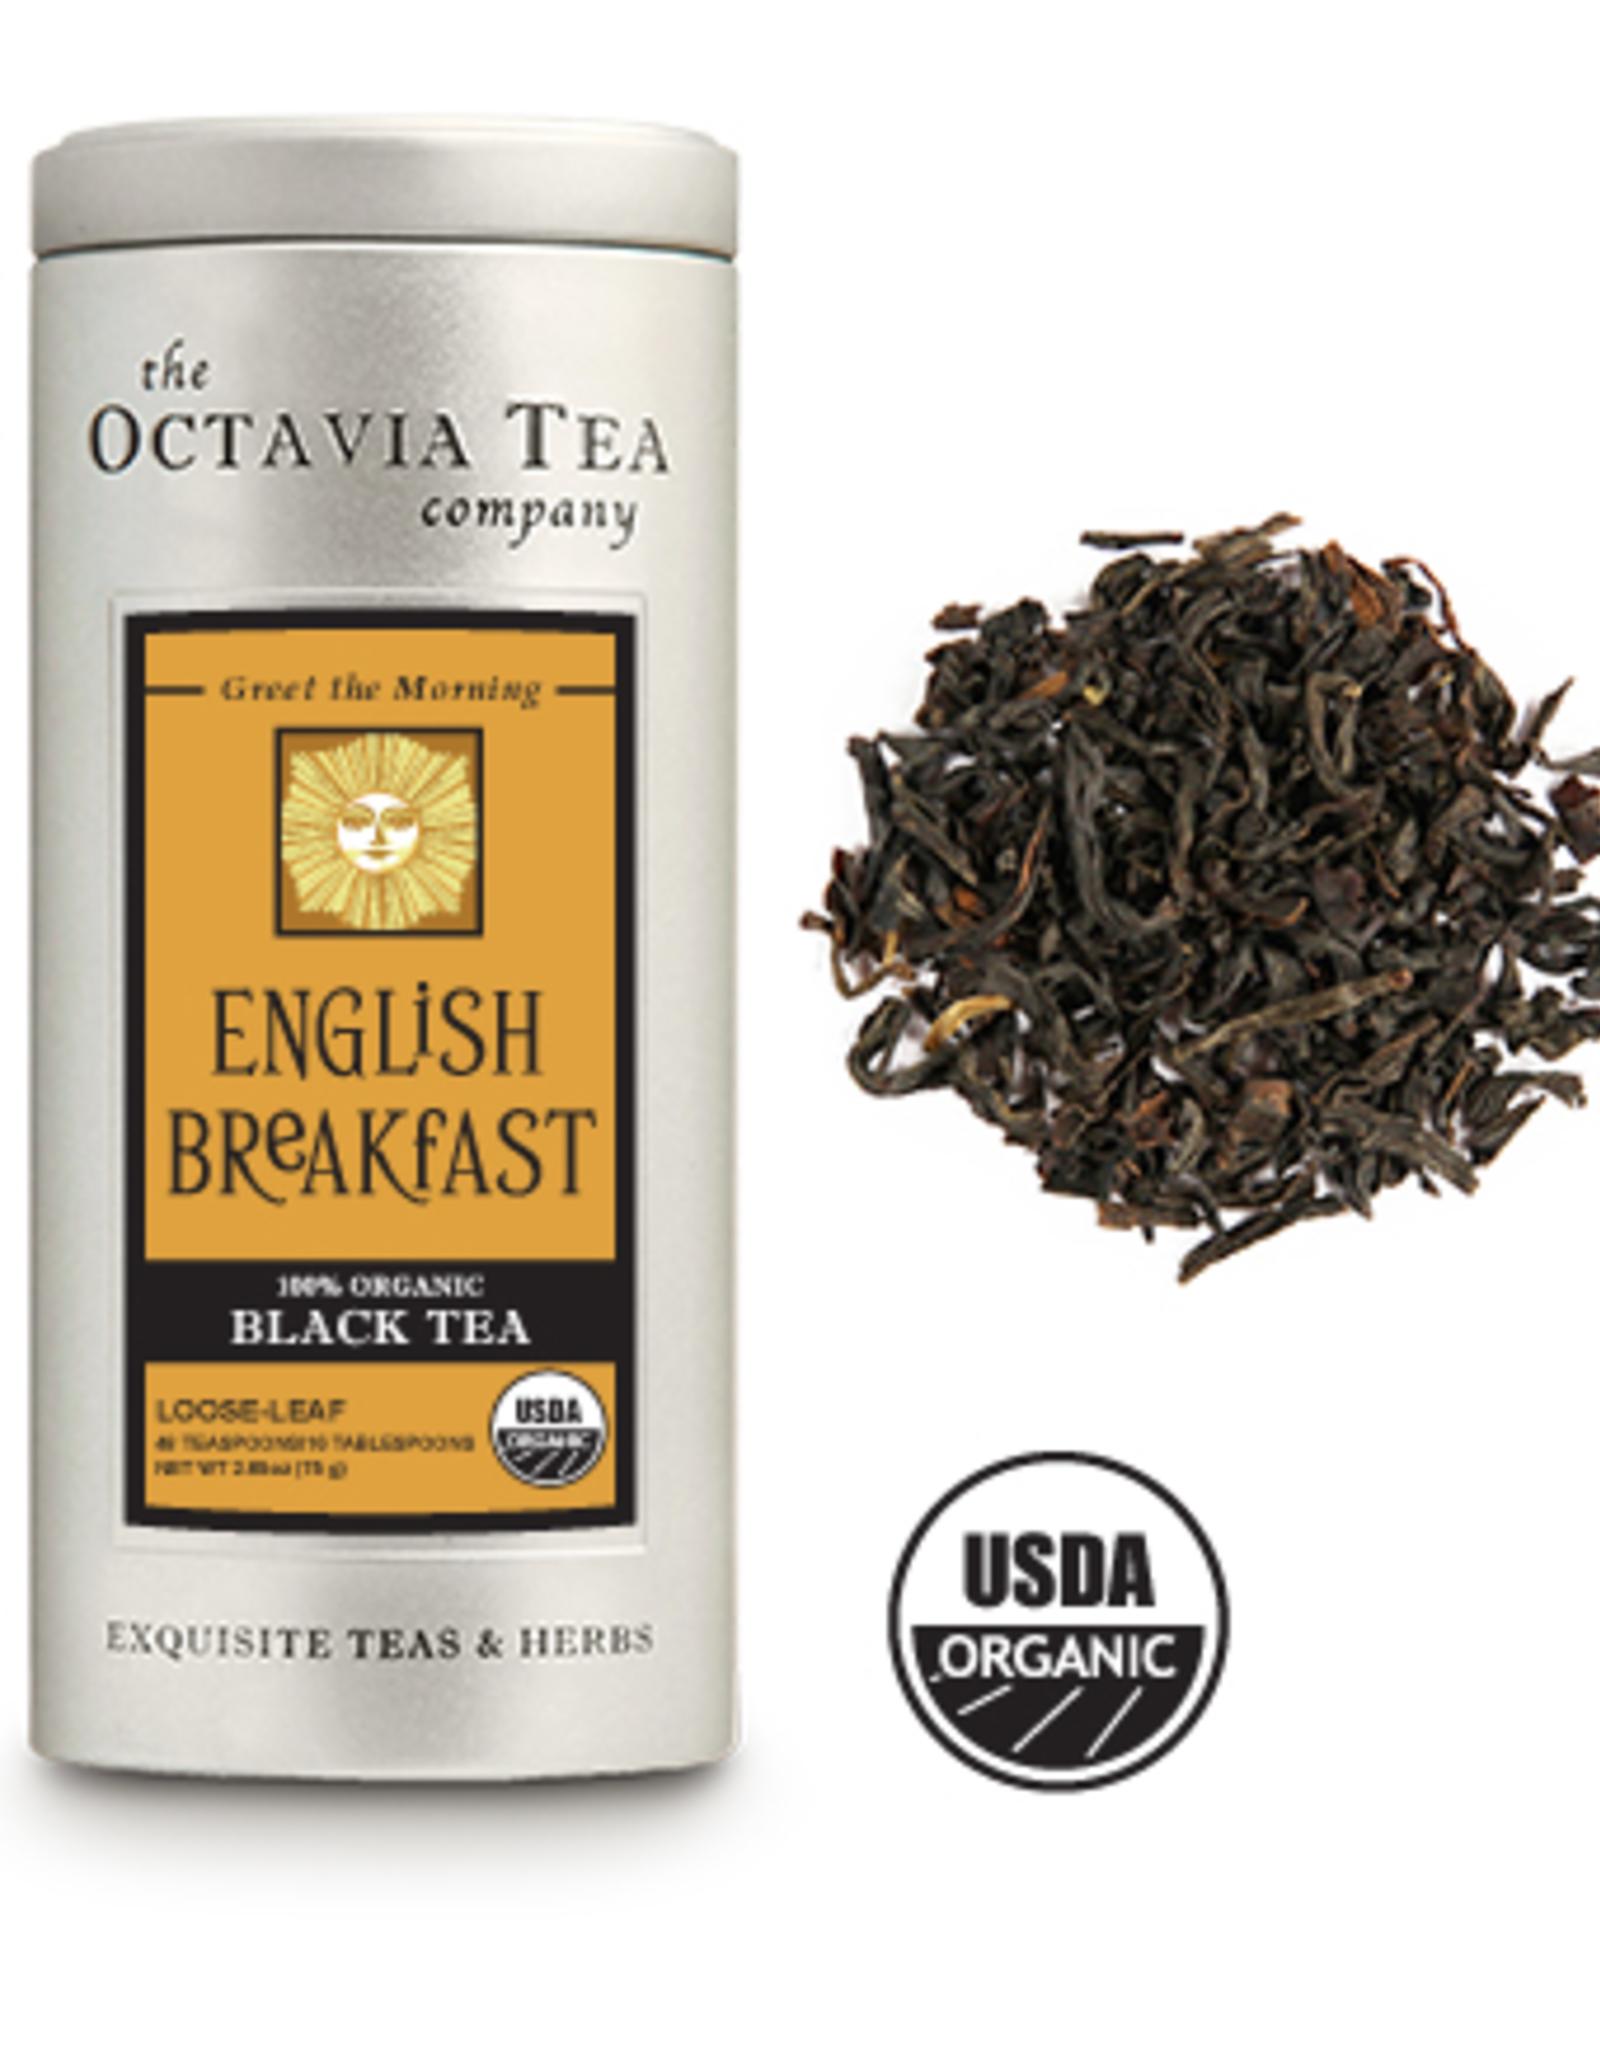 Octavia Tea Company English Breakfast Tea Tin, Loose Leaf